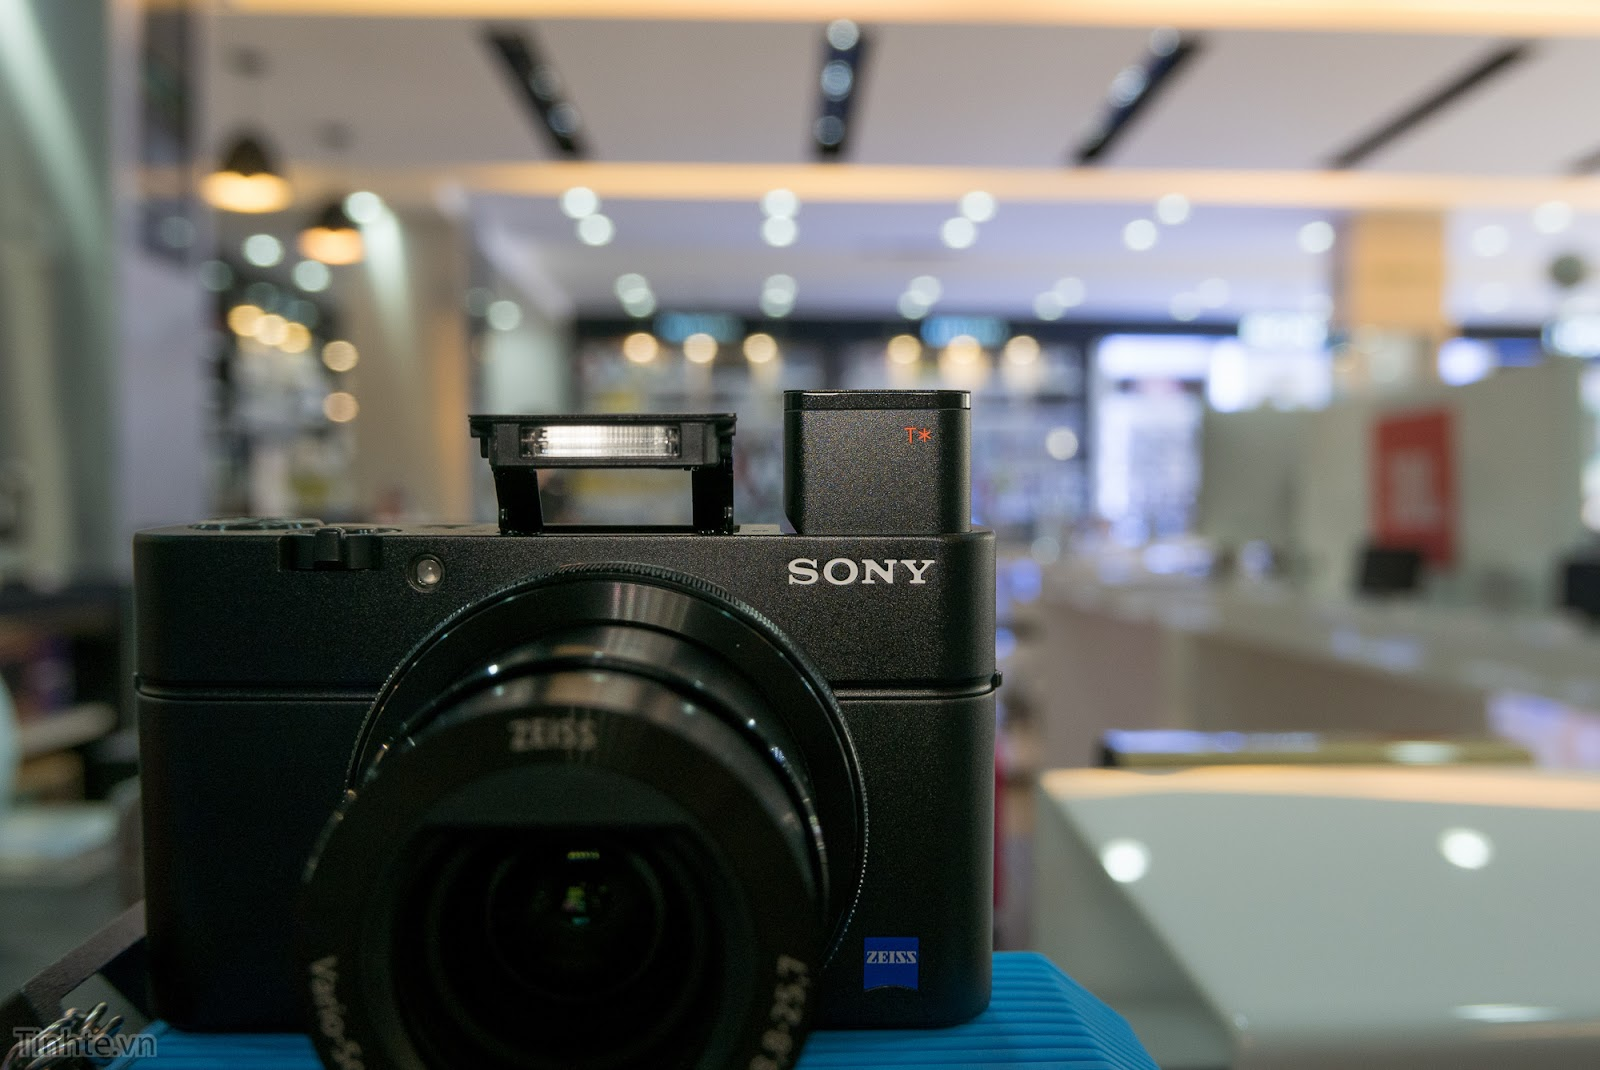 Tinhte.vn_Sony_RX100_mark_IV_4-5.